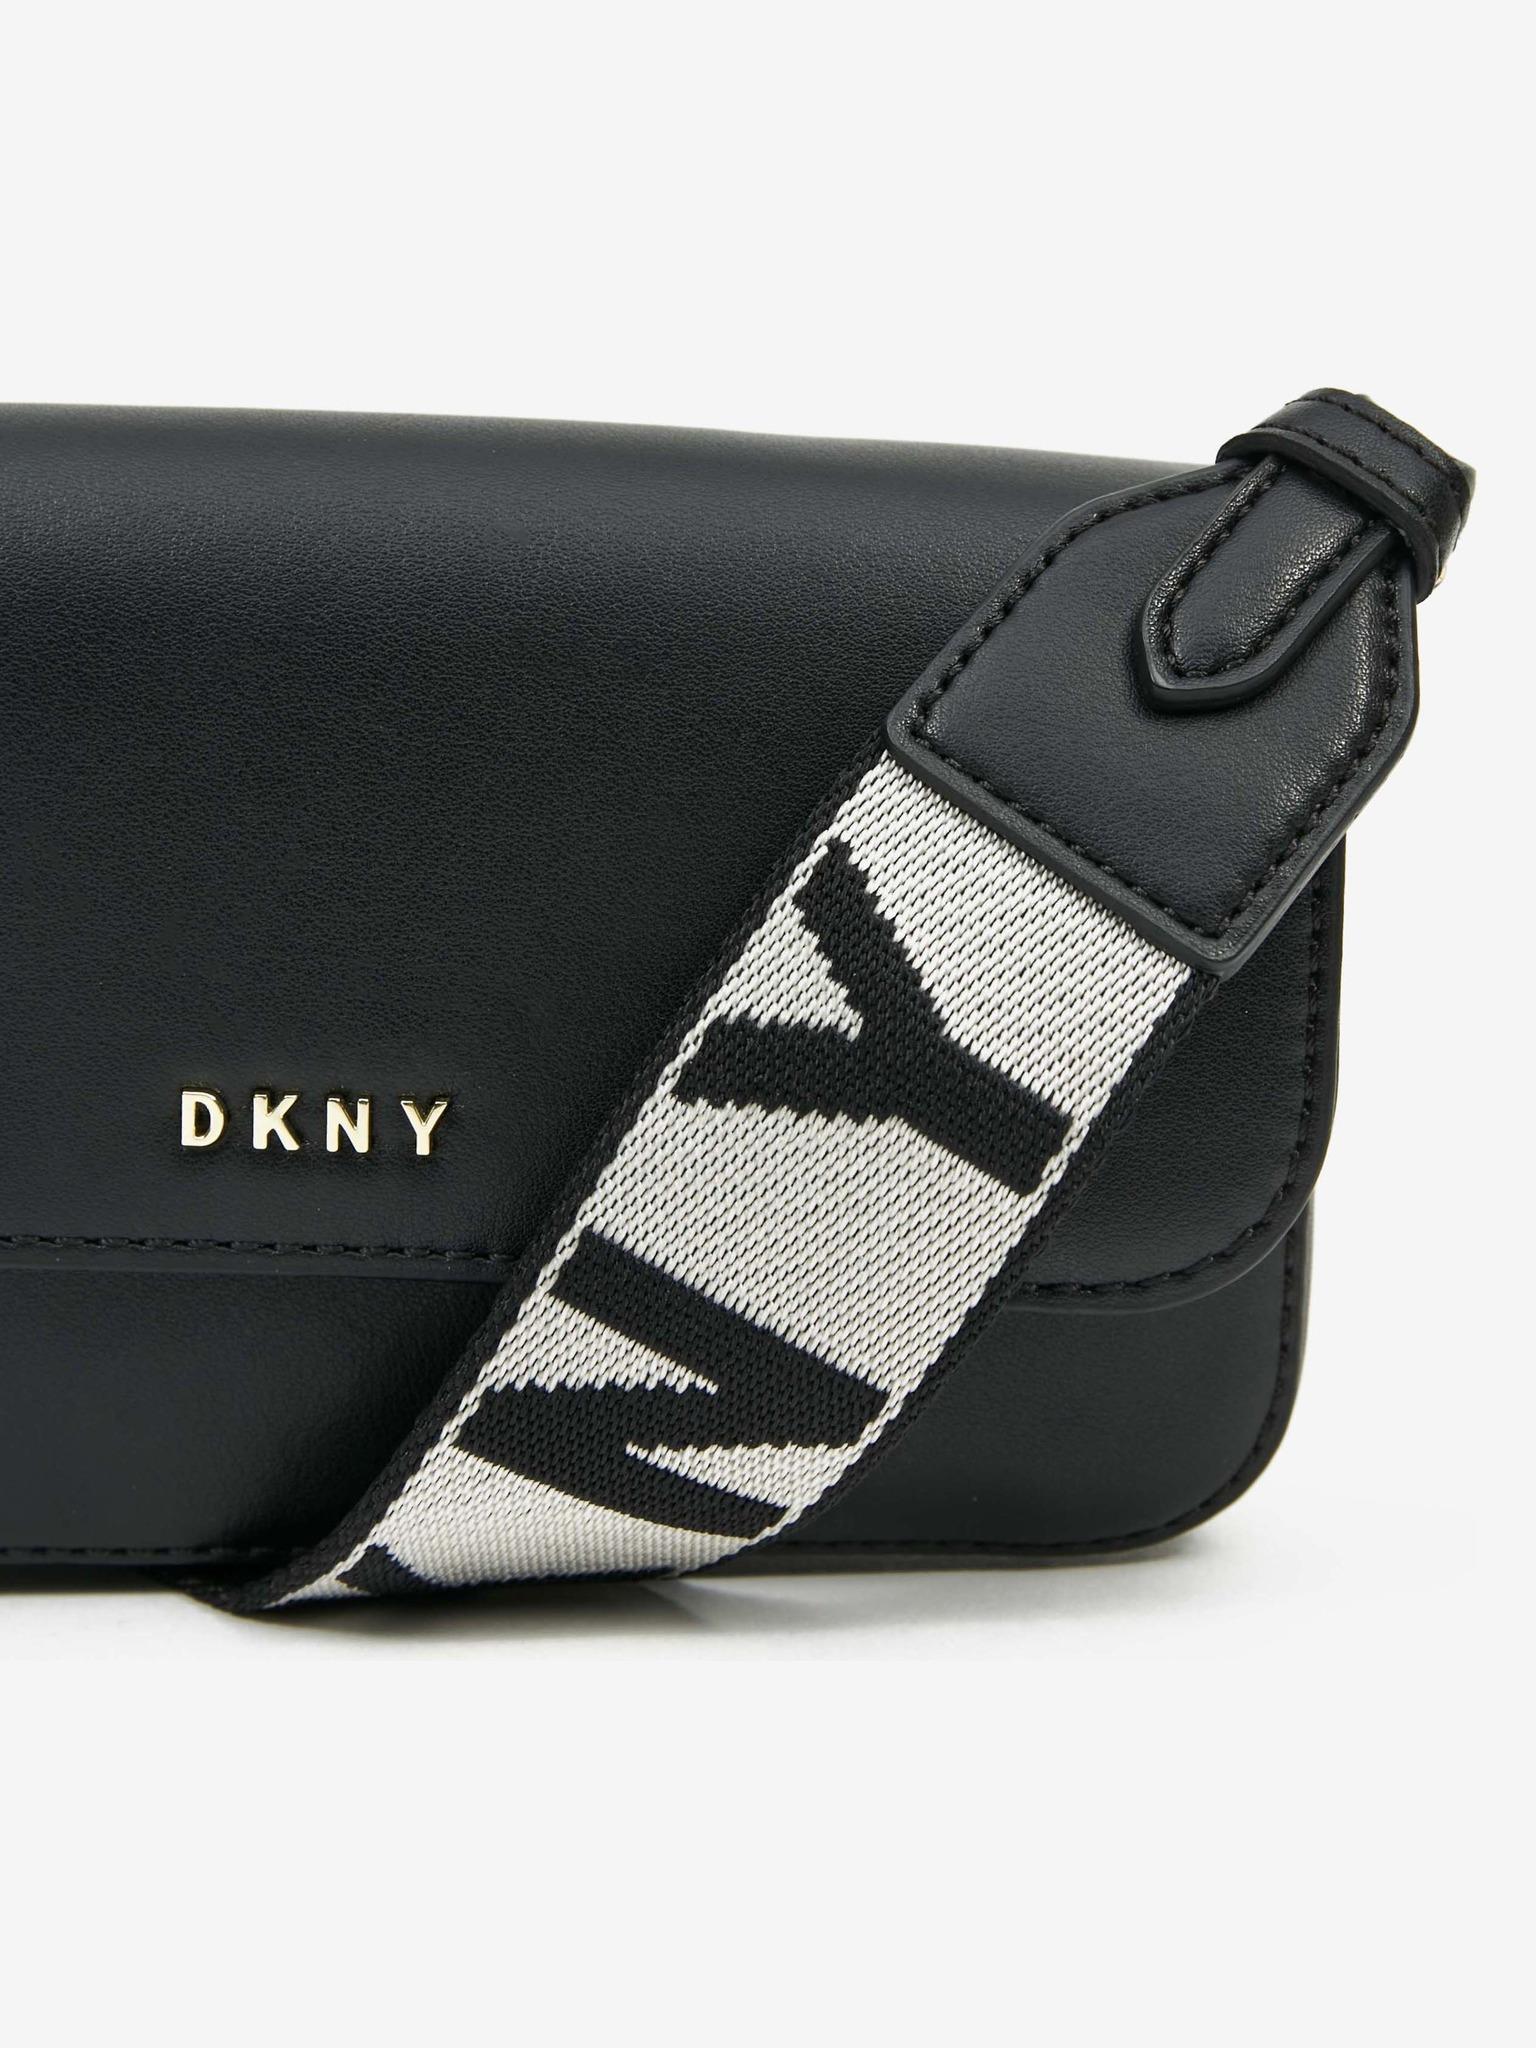 DKNY Borsetta donna nero